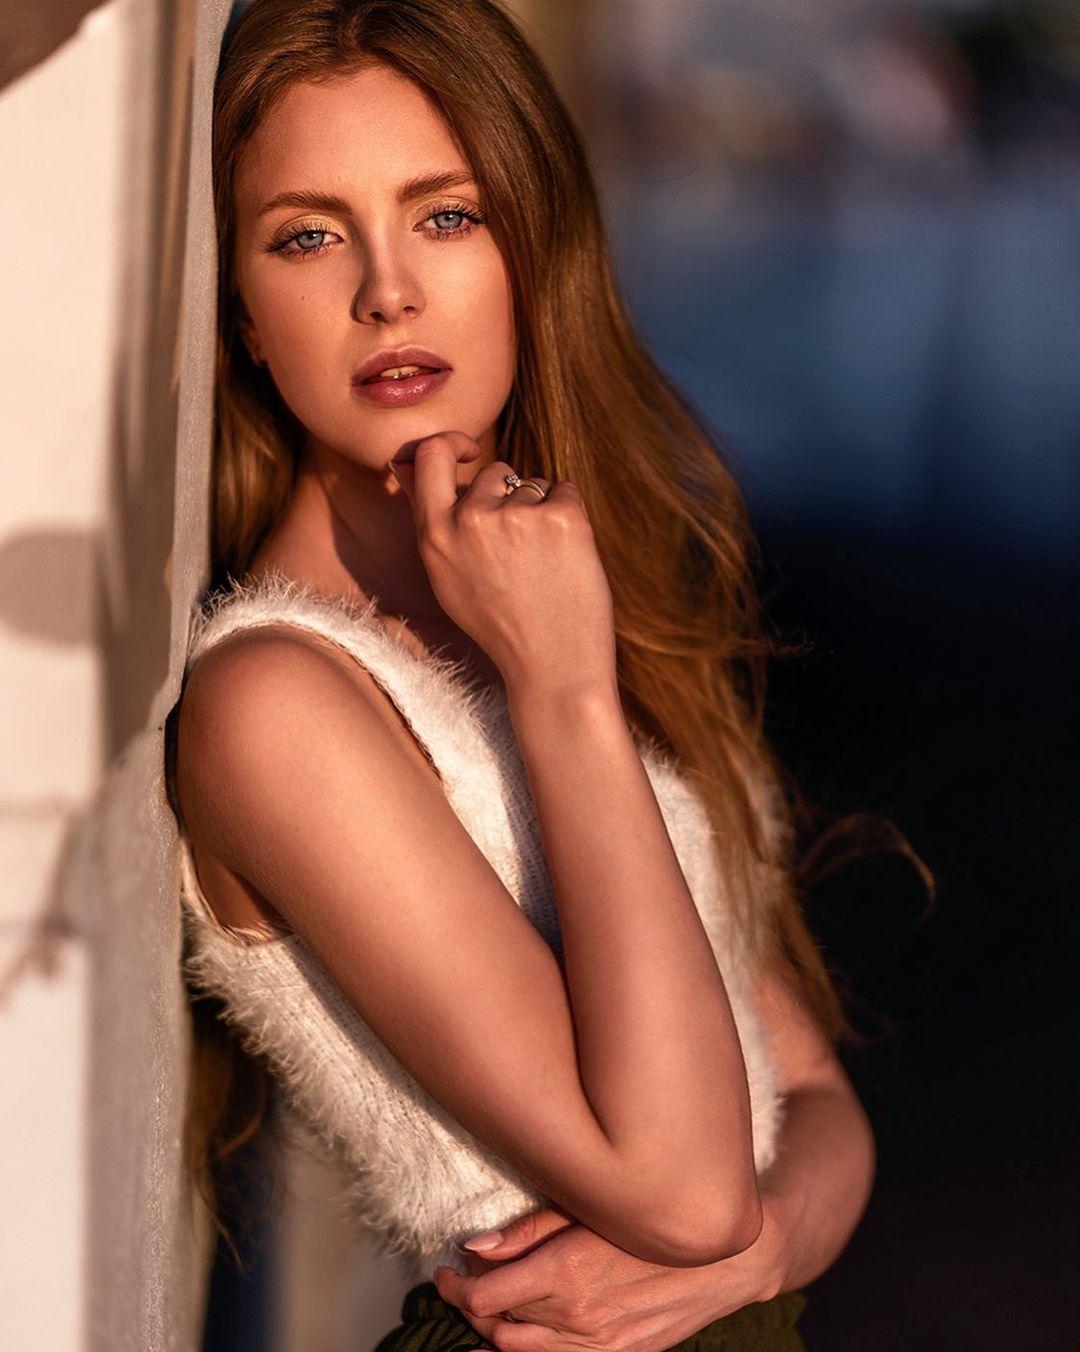 Nicole-marie-j-Wallpapers-Insta-Fit-Bio-4